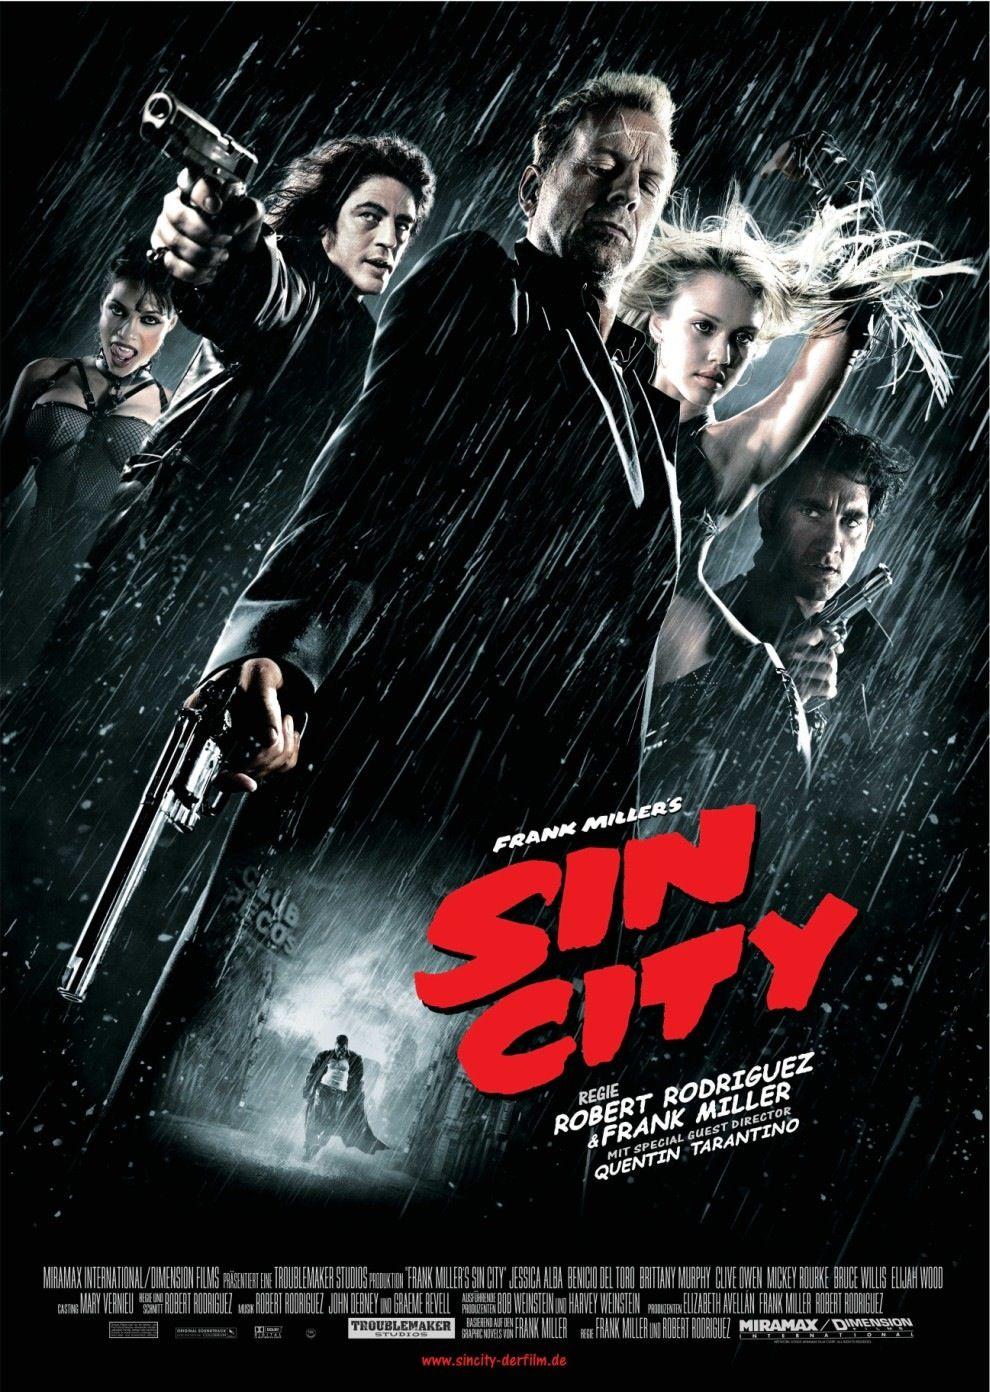 Sin City - Thank you Robert Rodriguez!